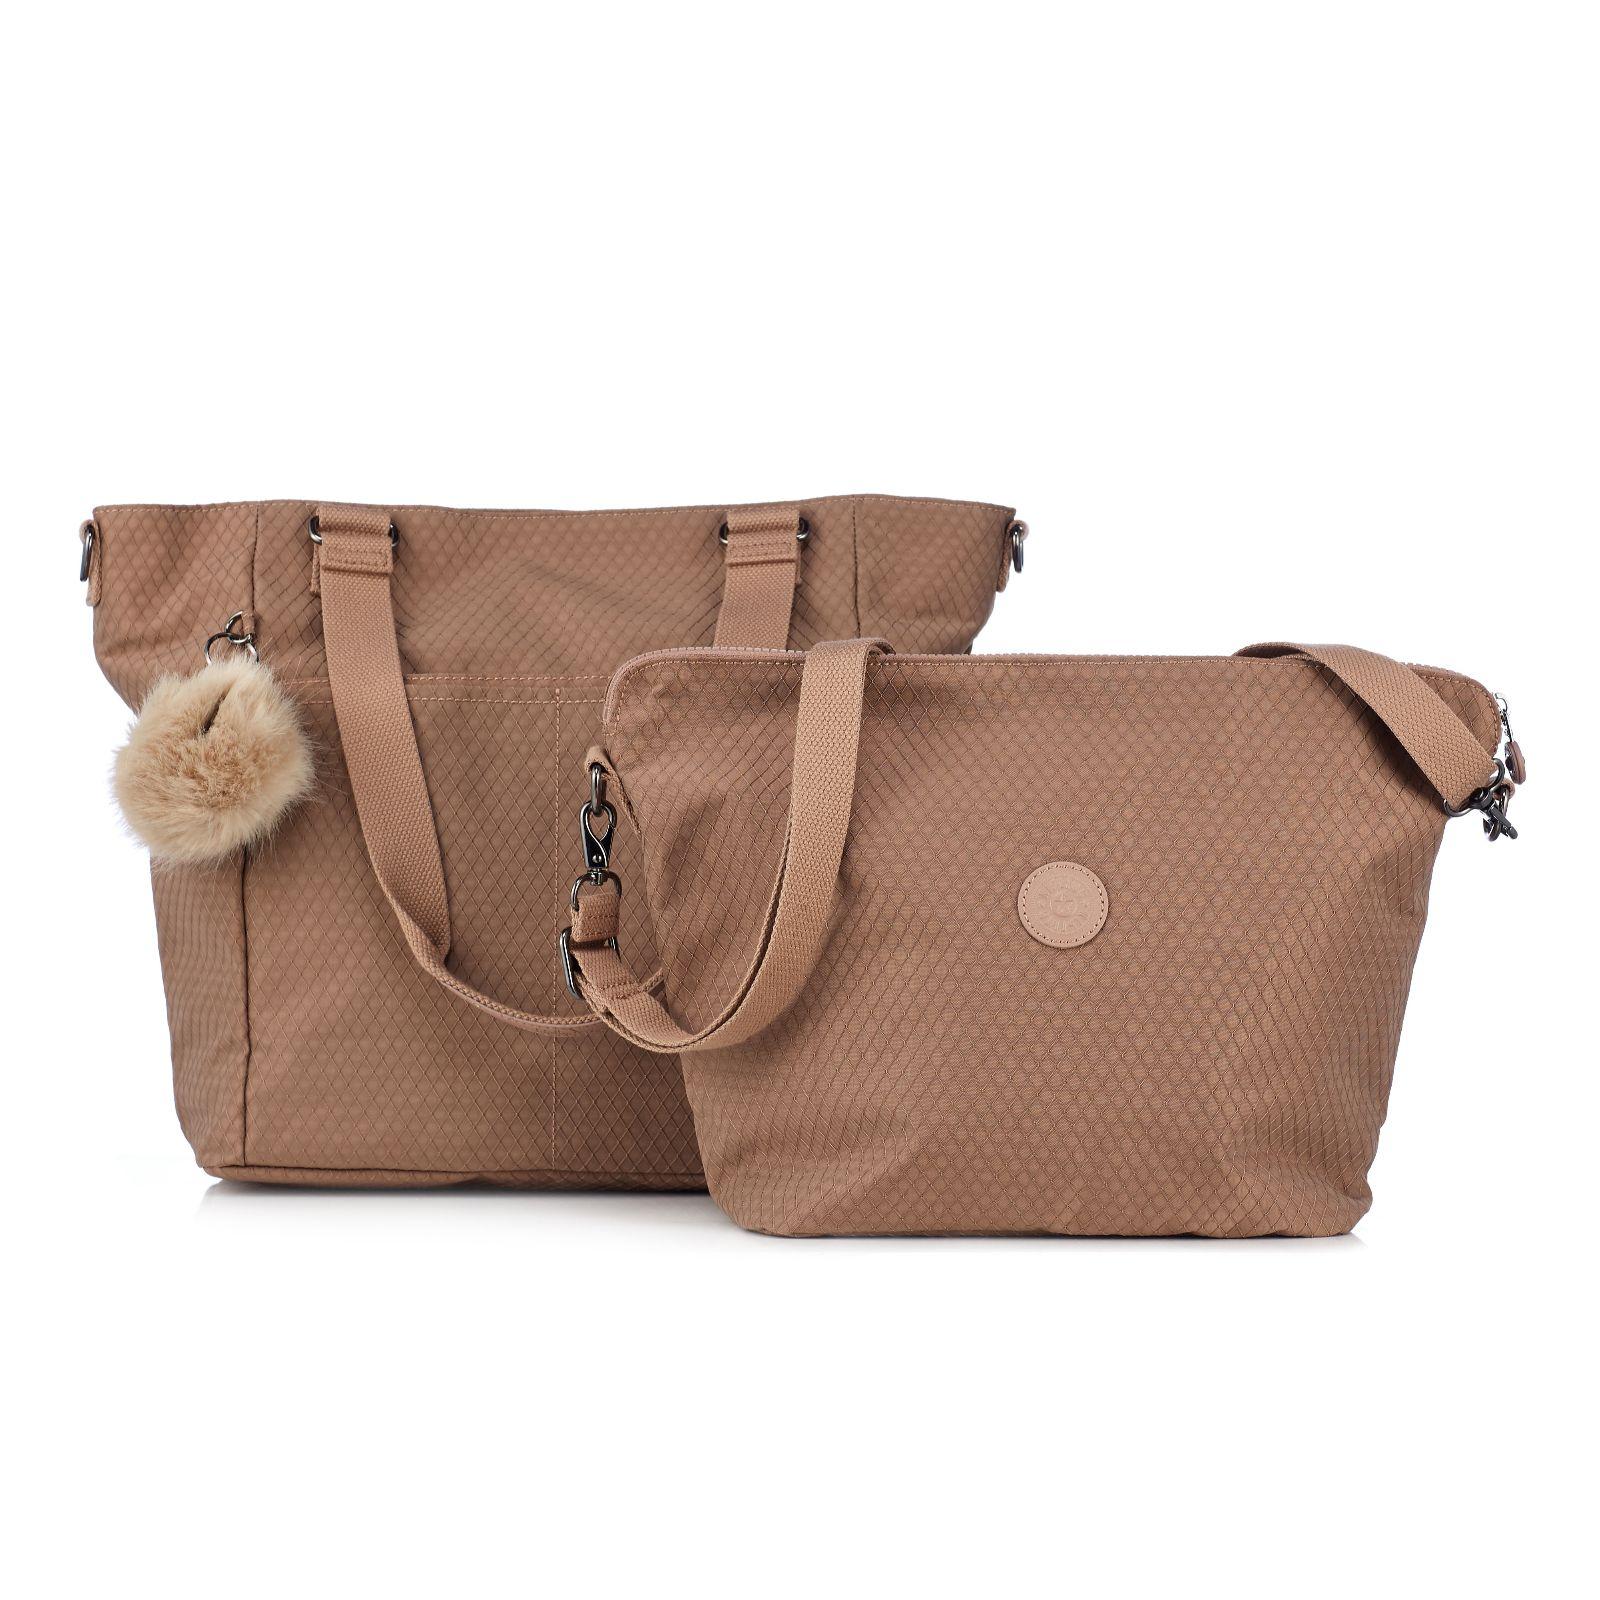 Kipling Audria Premium Large 2 in 1 Tote Bag with Shoulder Strap ... fe53e1b14a222